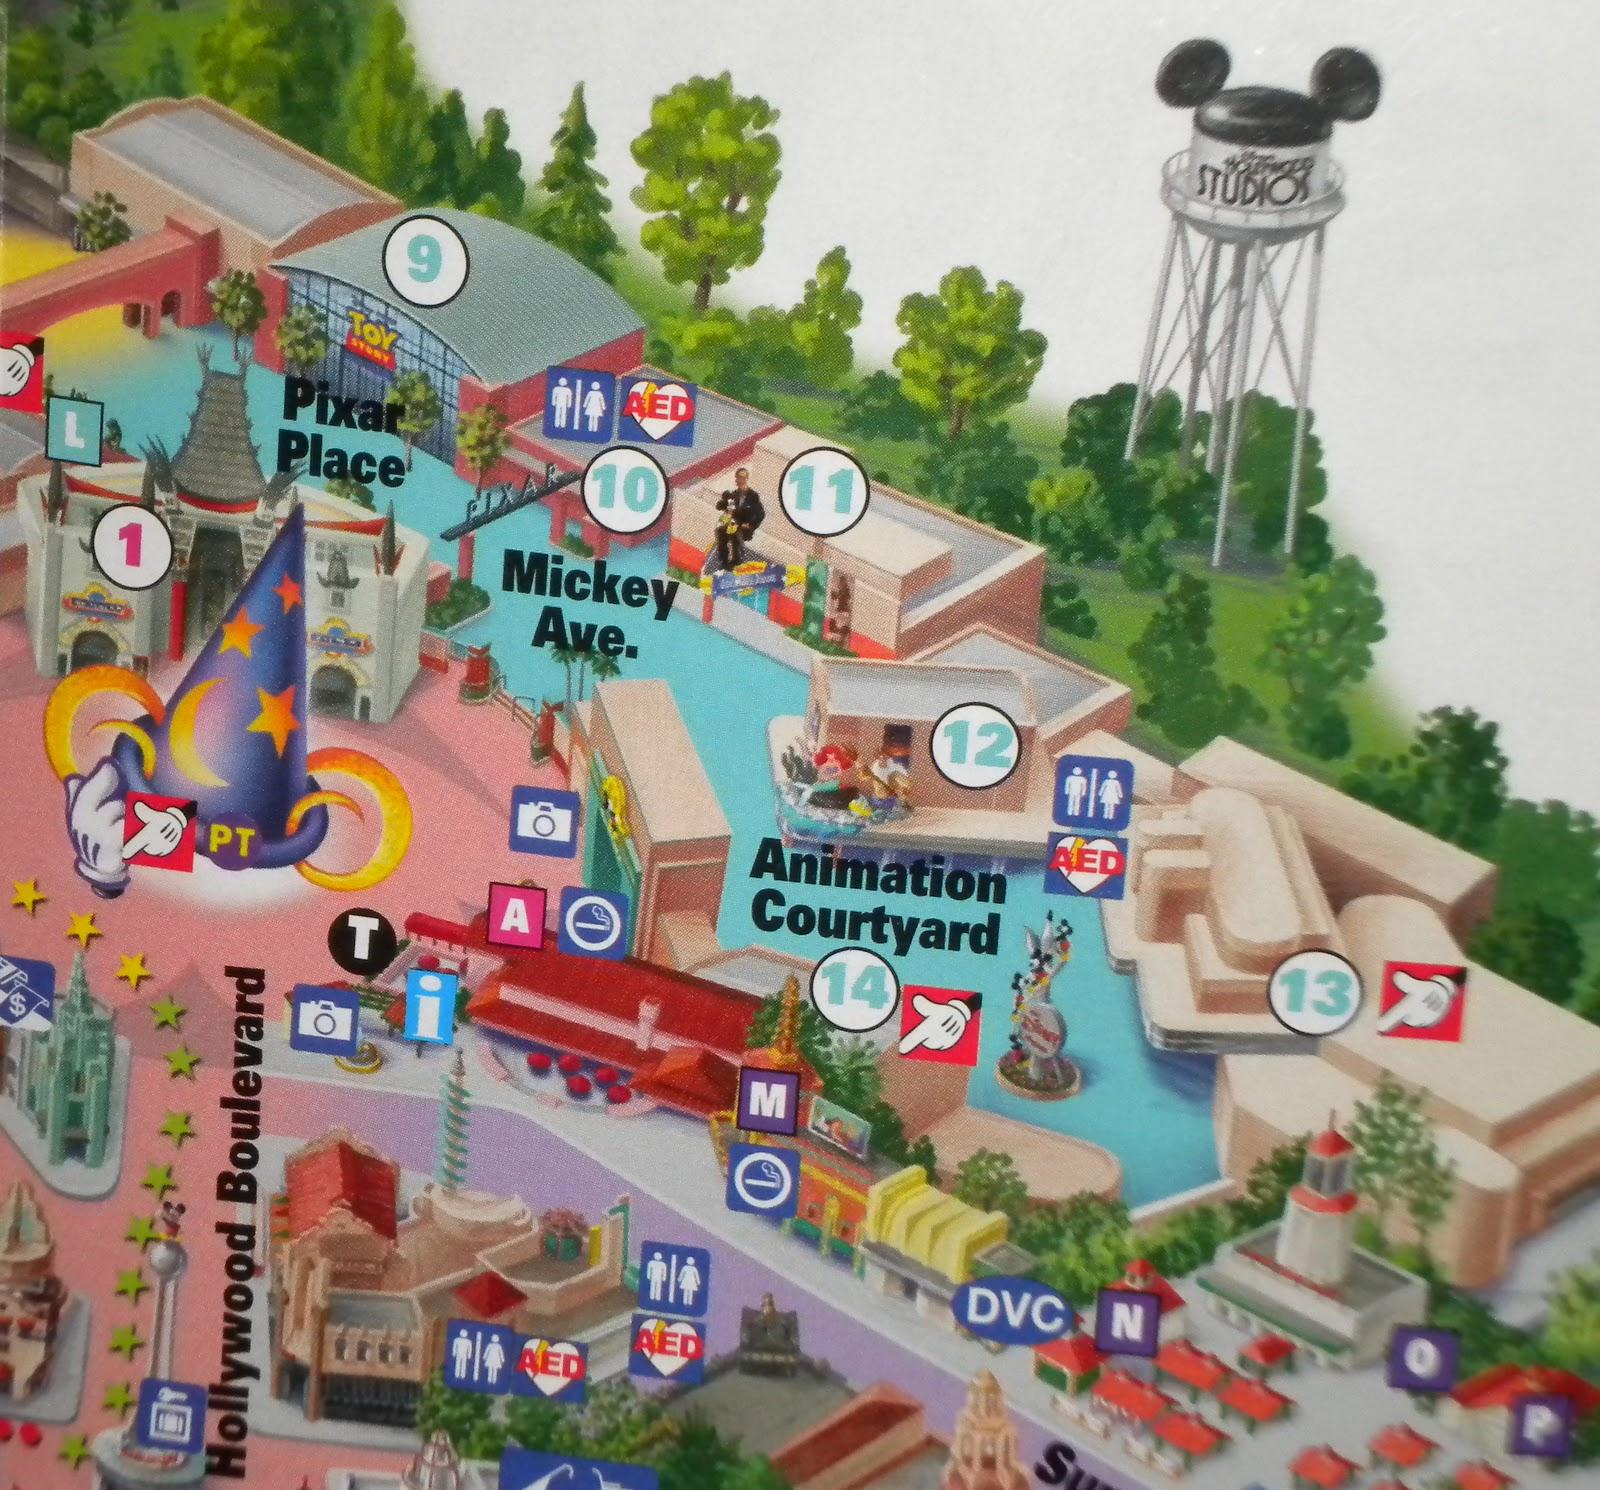 Apartments Near Disney World: Animation Courtyard In Disney Hollywood Studios